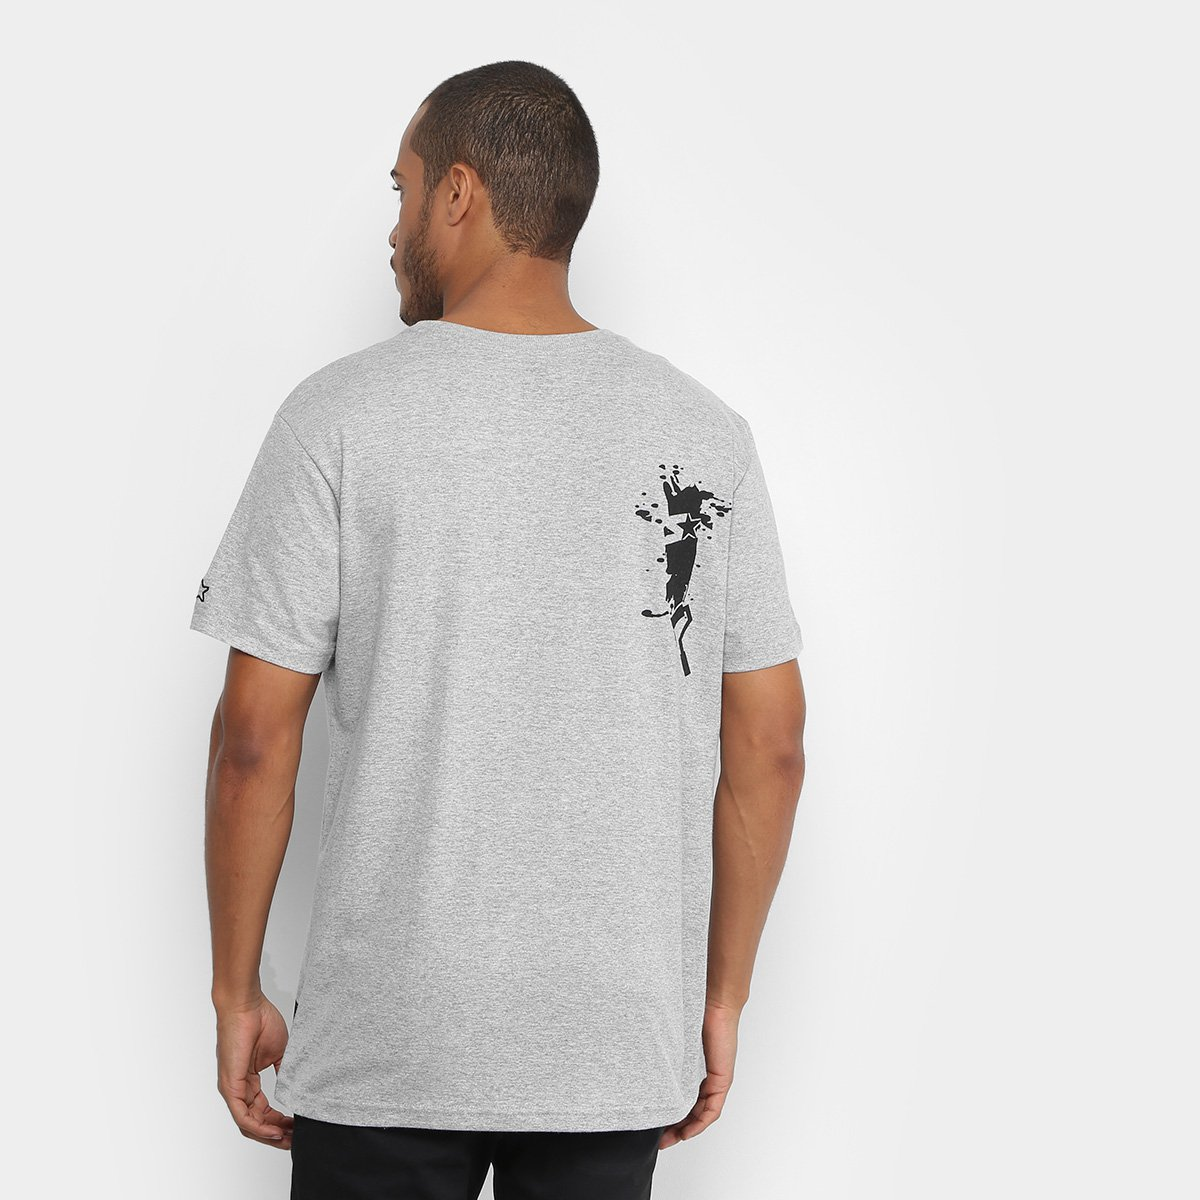 Camiseta Starter Pixo Masculina  Camiseta Starter Pixo Masculina ... cfb139c72cd